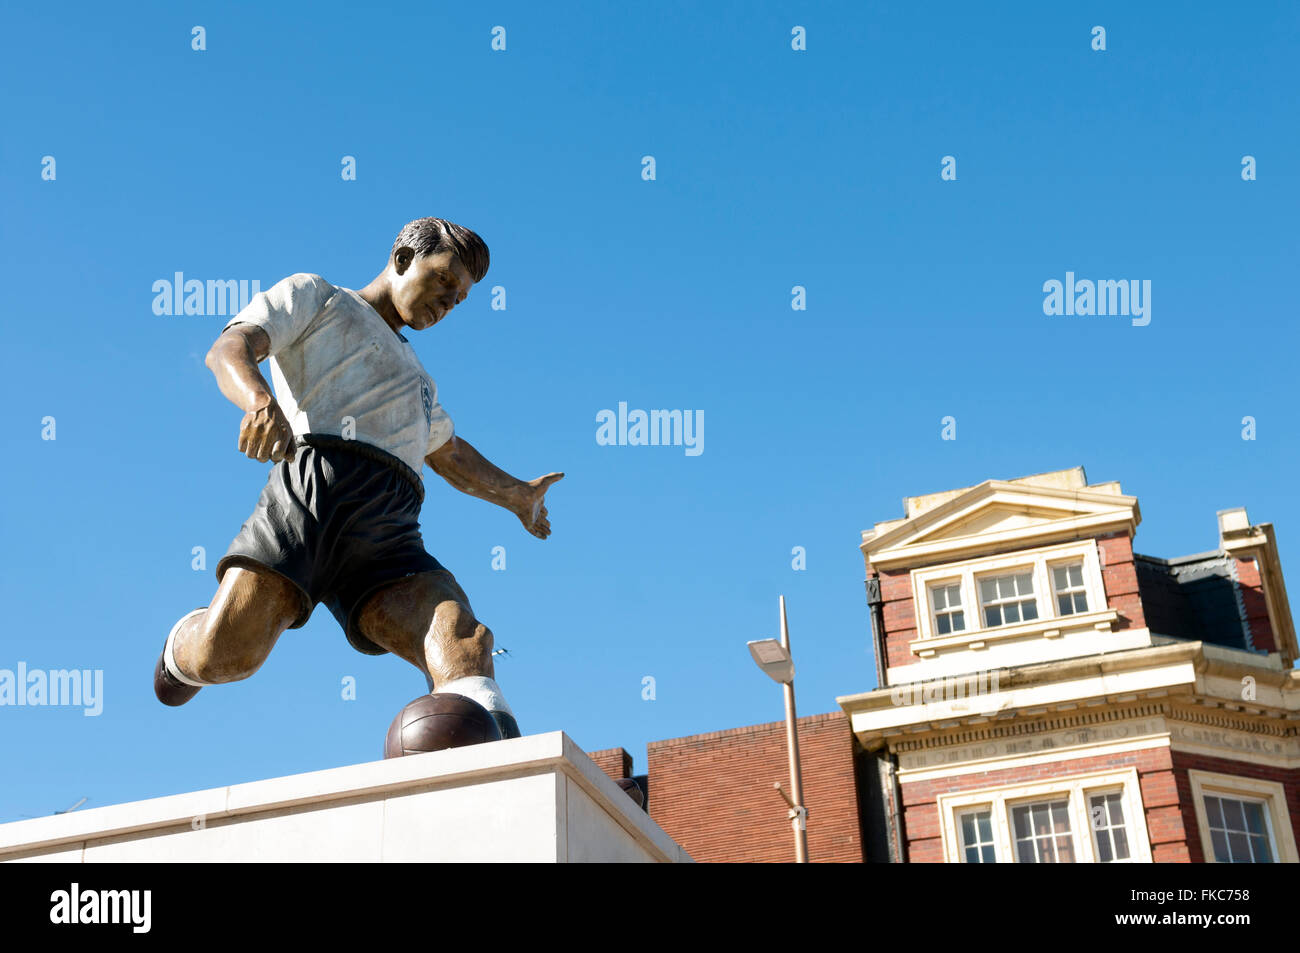 Duncan Edwards statue, Dudley town centre, West Midlands, England, UK - Stock Image